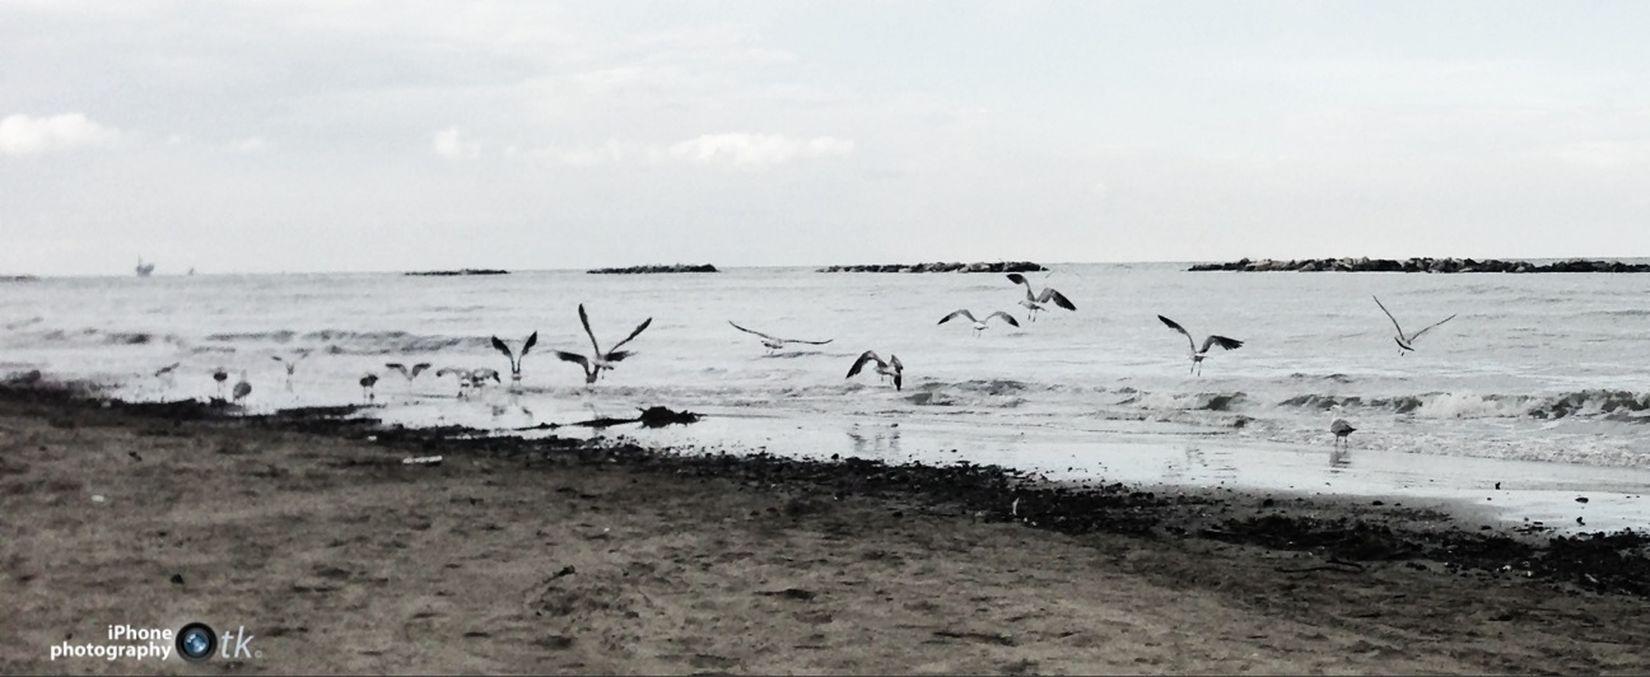 Sea Beach Seagulls Don't Be Square